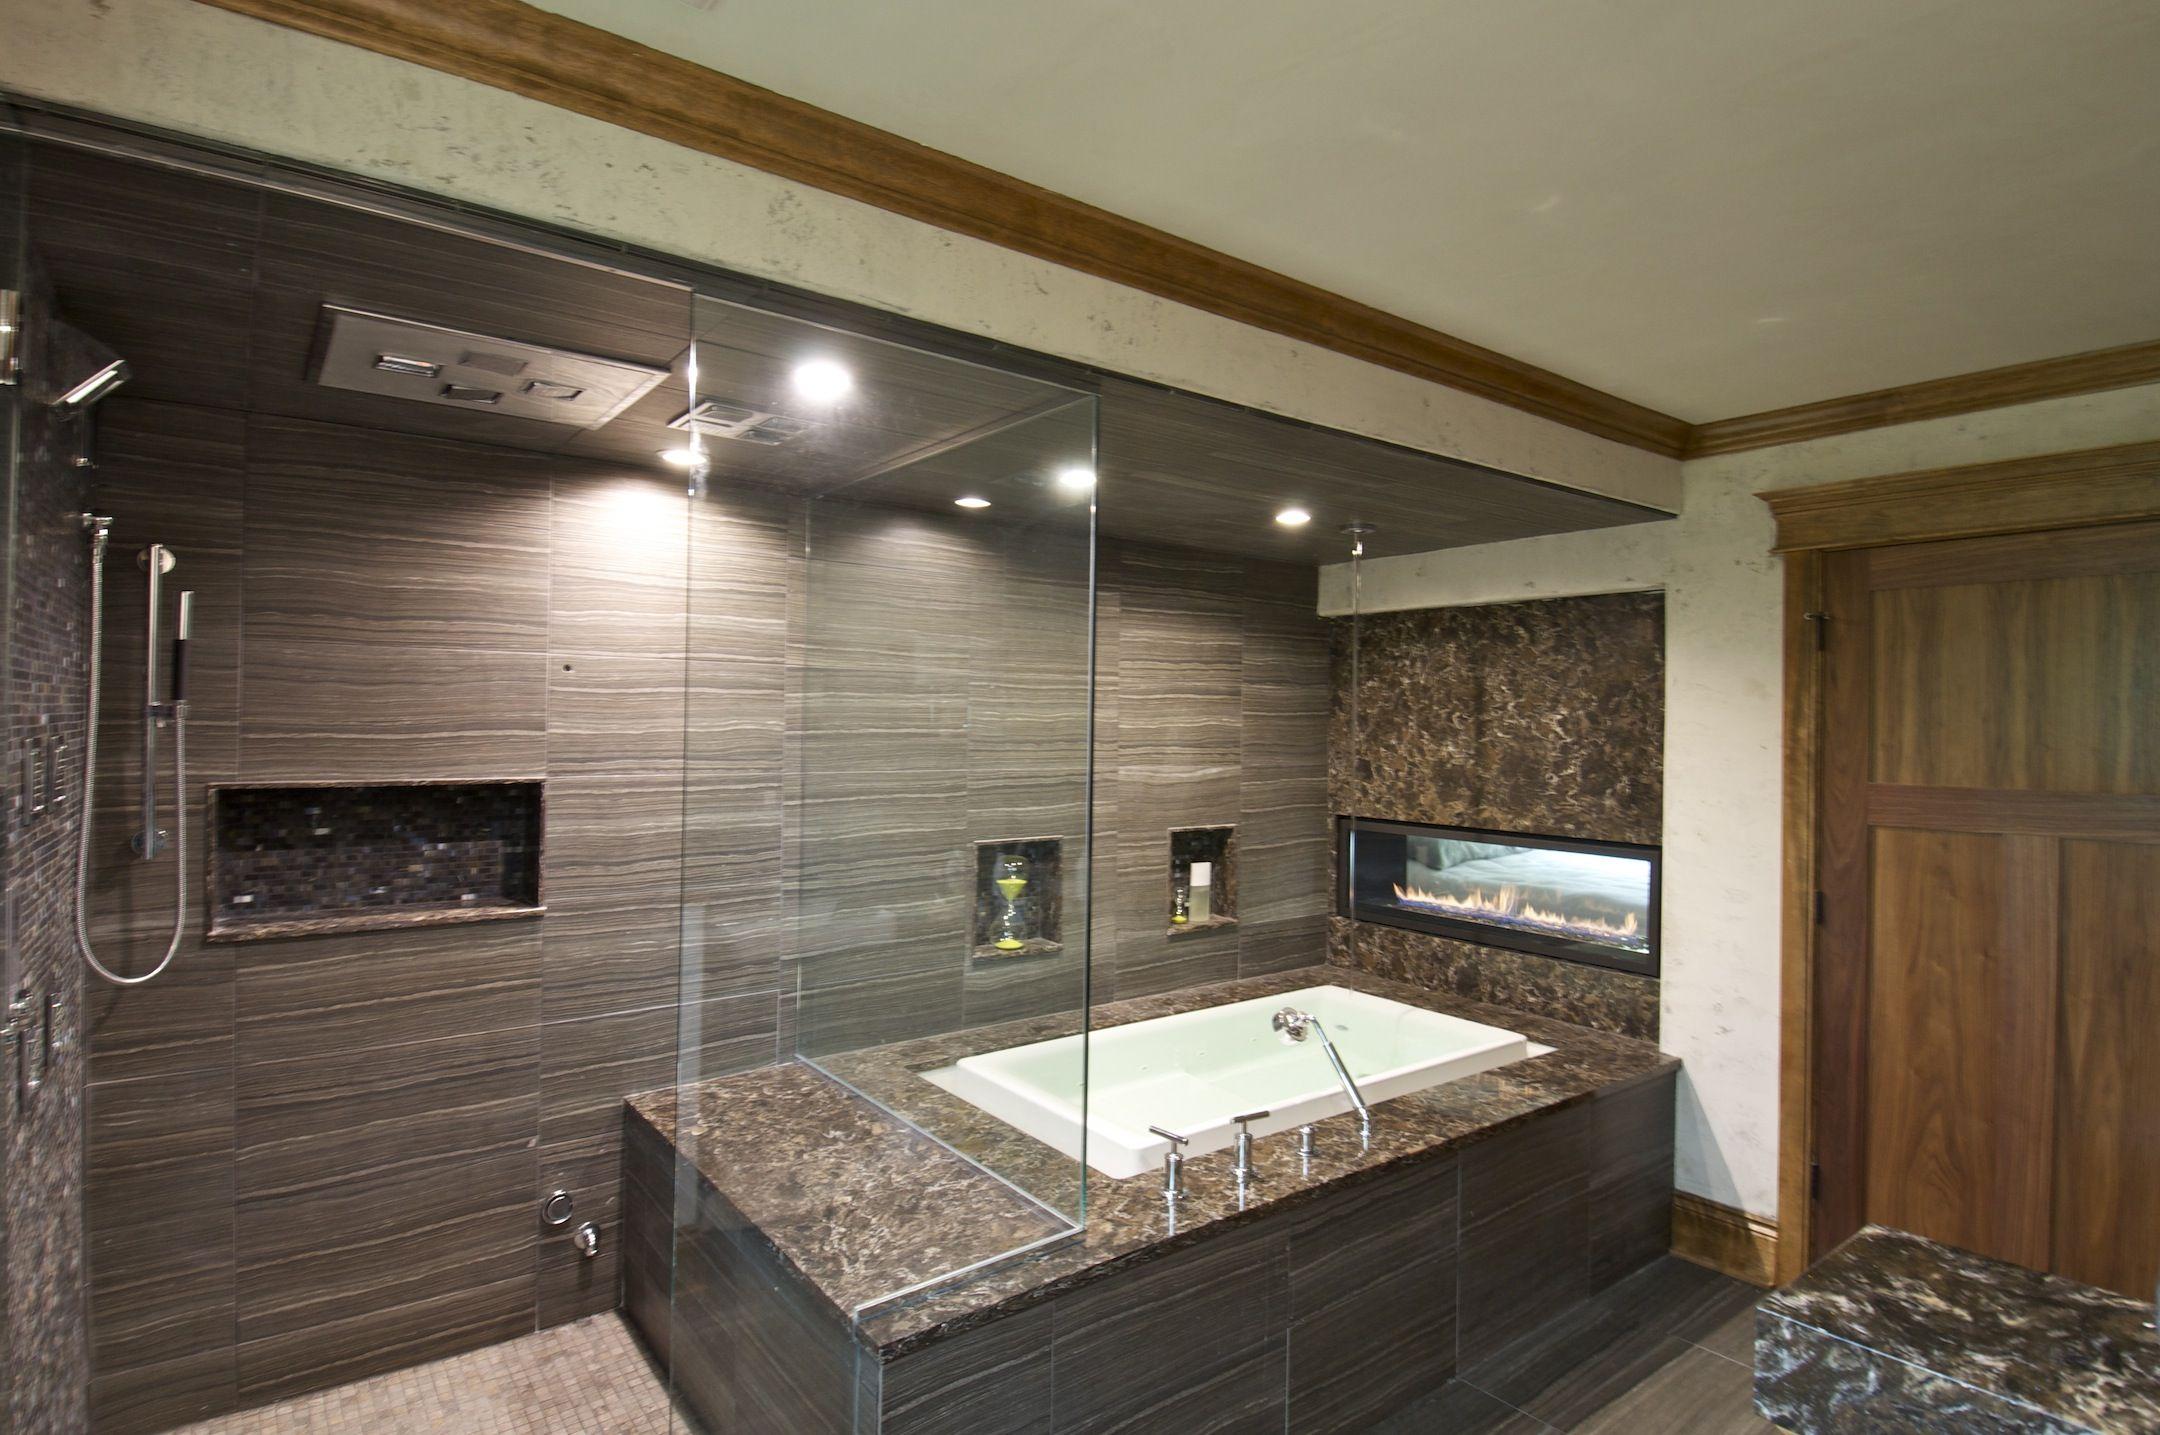 Dream Bathroom Design With Tile Granite Shower Soaker Tub And Gas - Bathroom design minneapolis